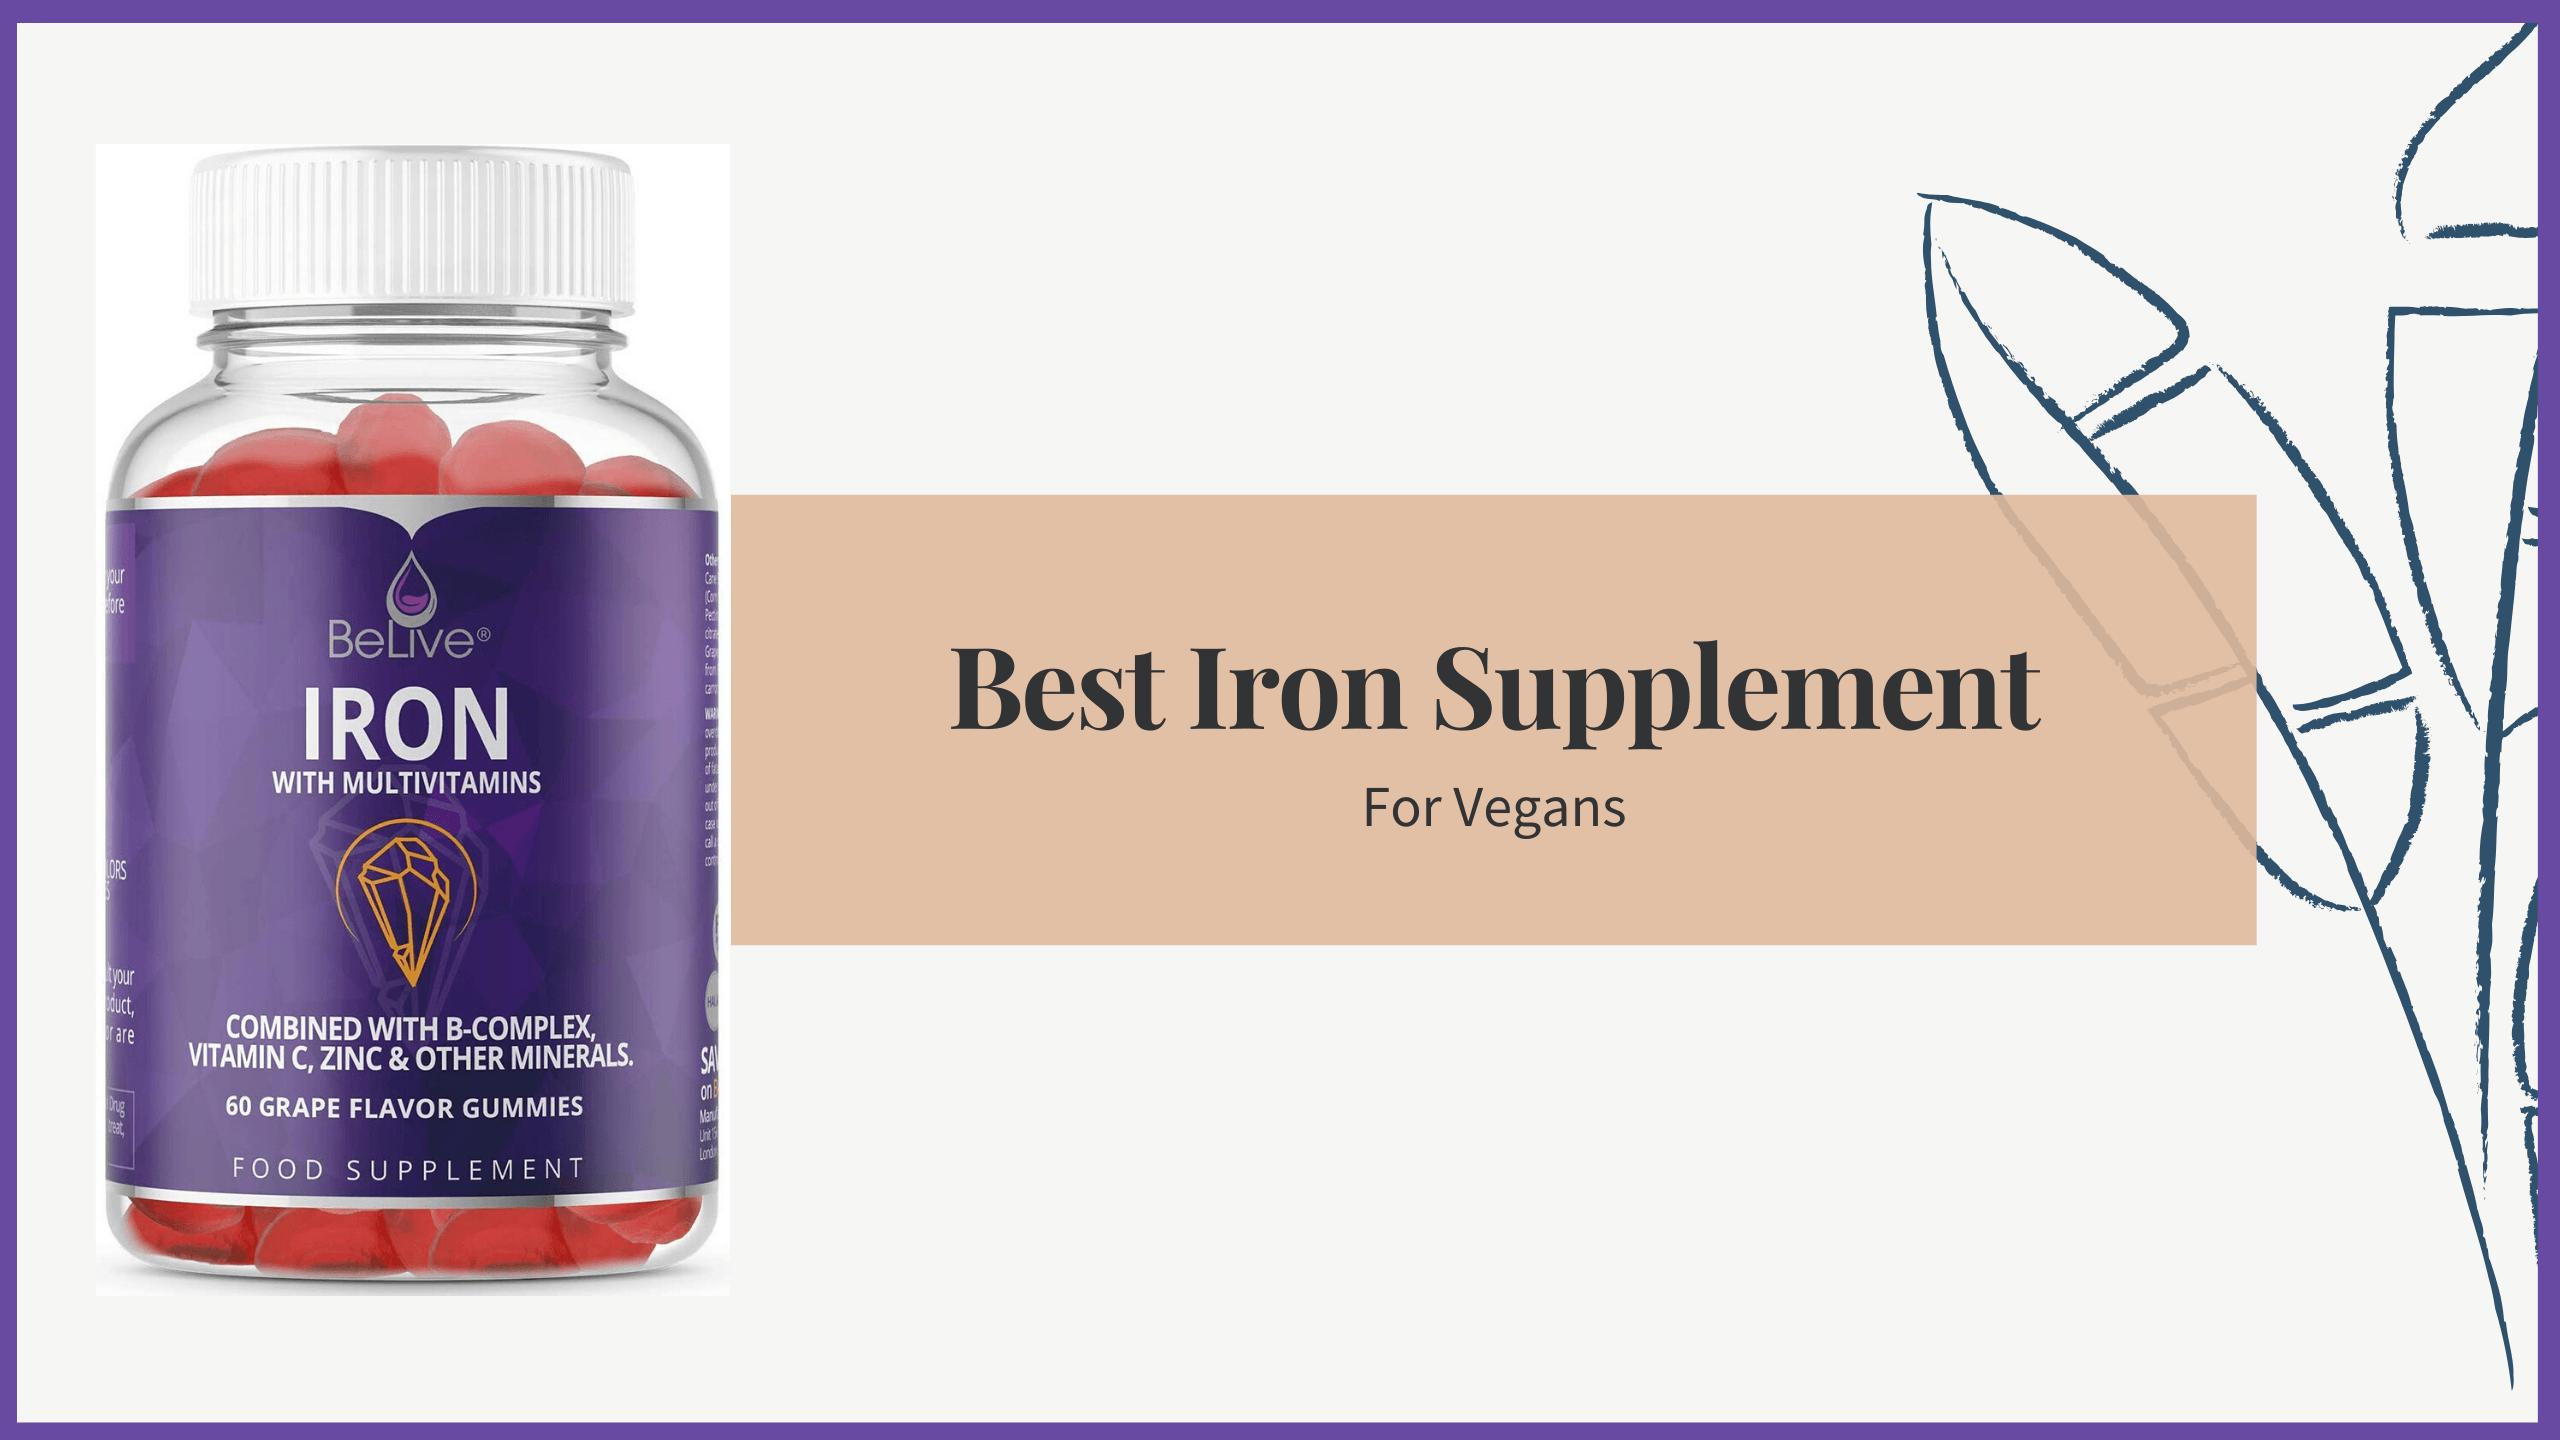 best iron supplements for vegans